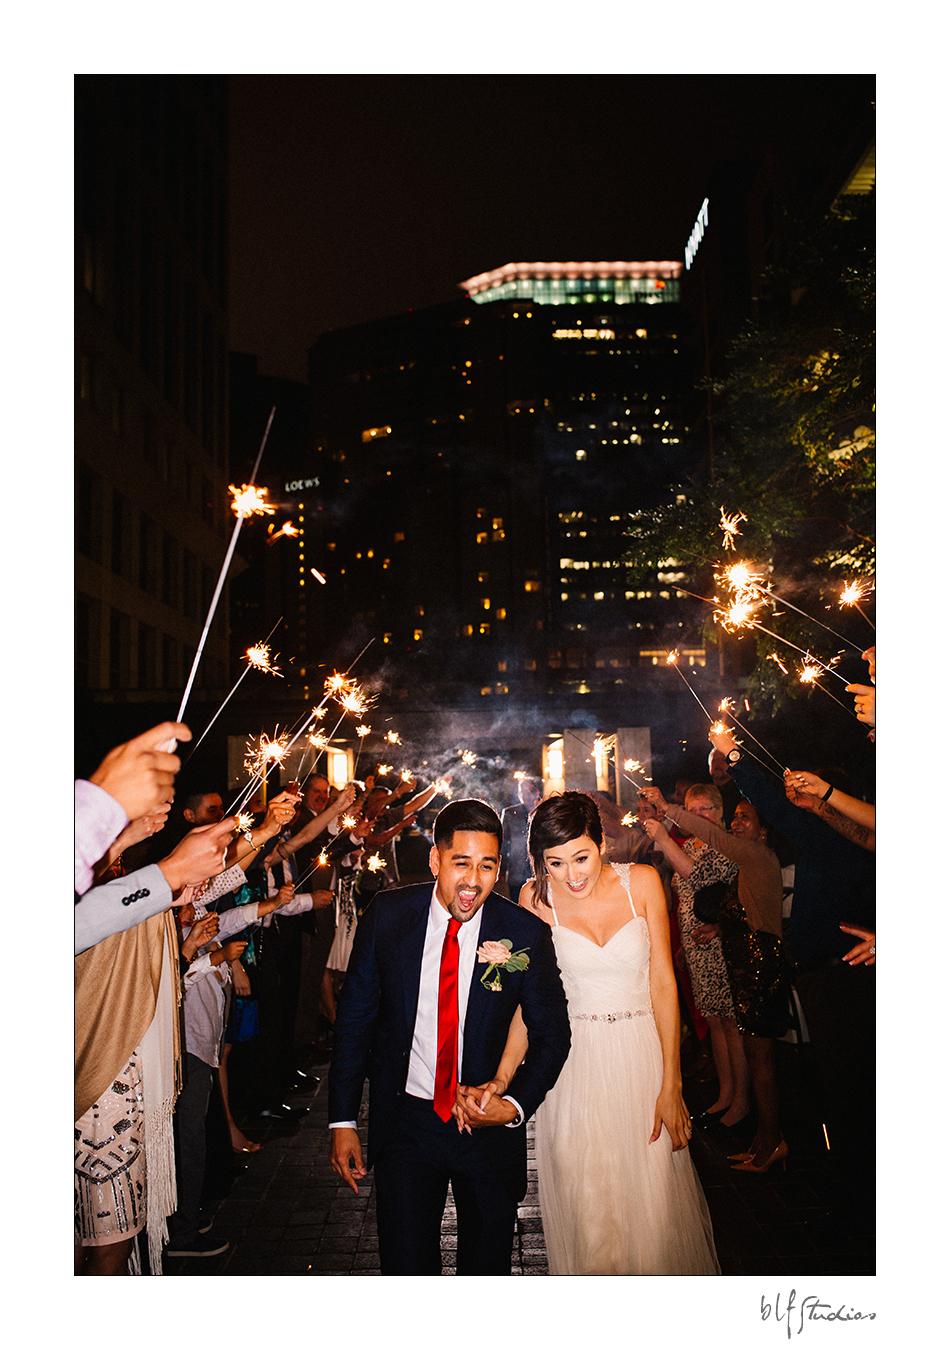 0054-blfstudios-wedding-photographer-daniel-danielle-atlanta.jpg